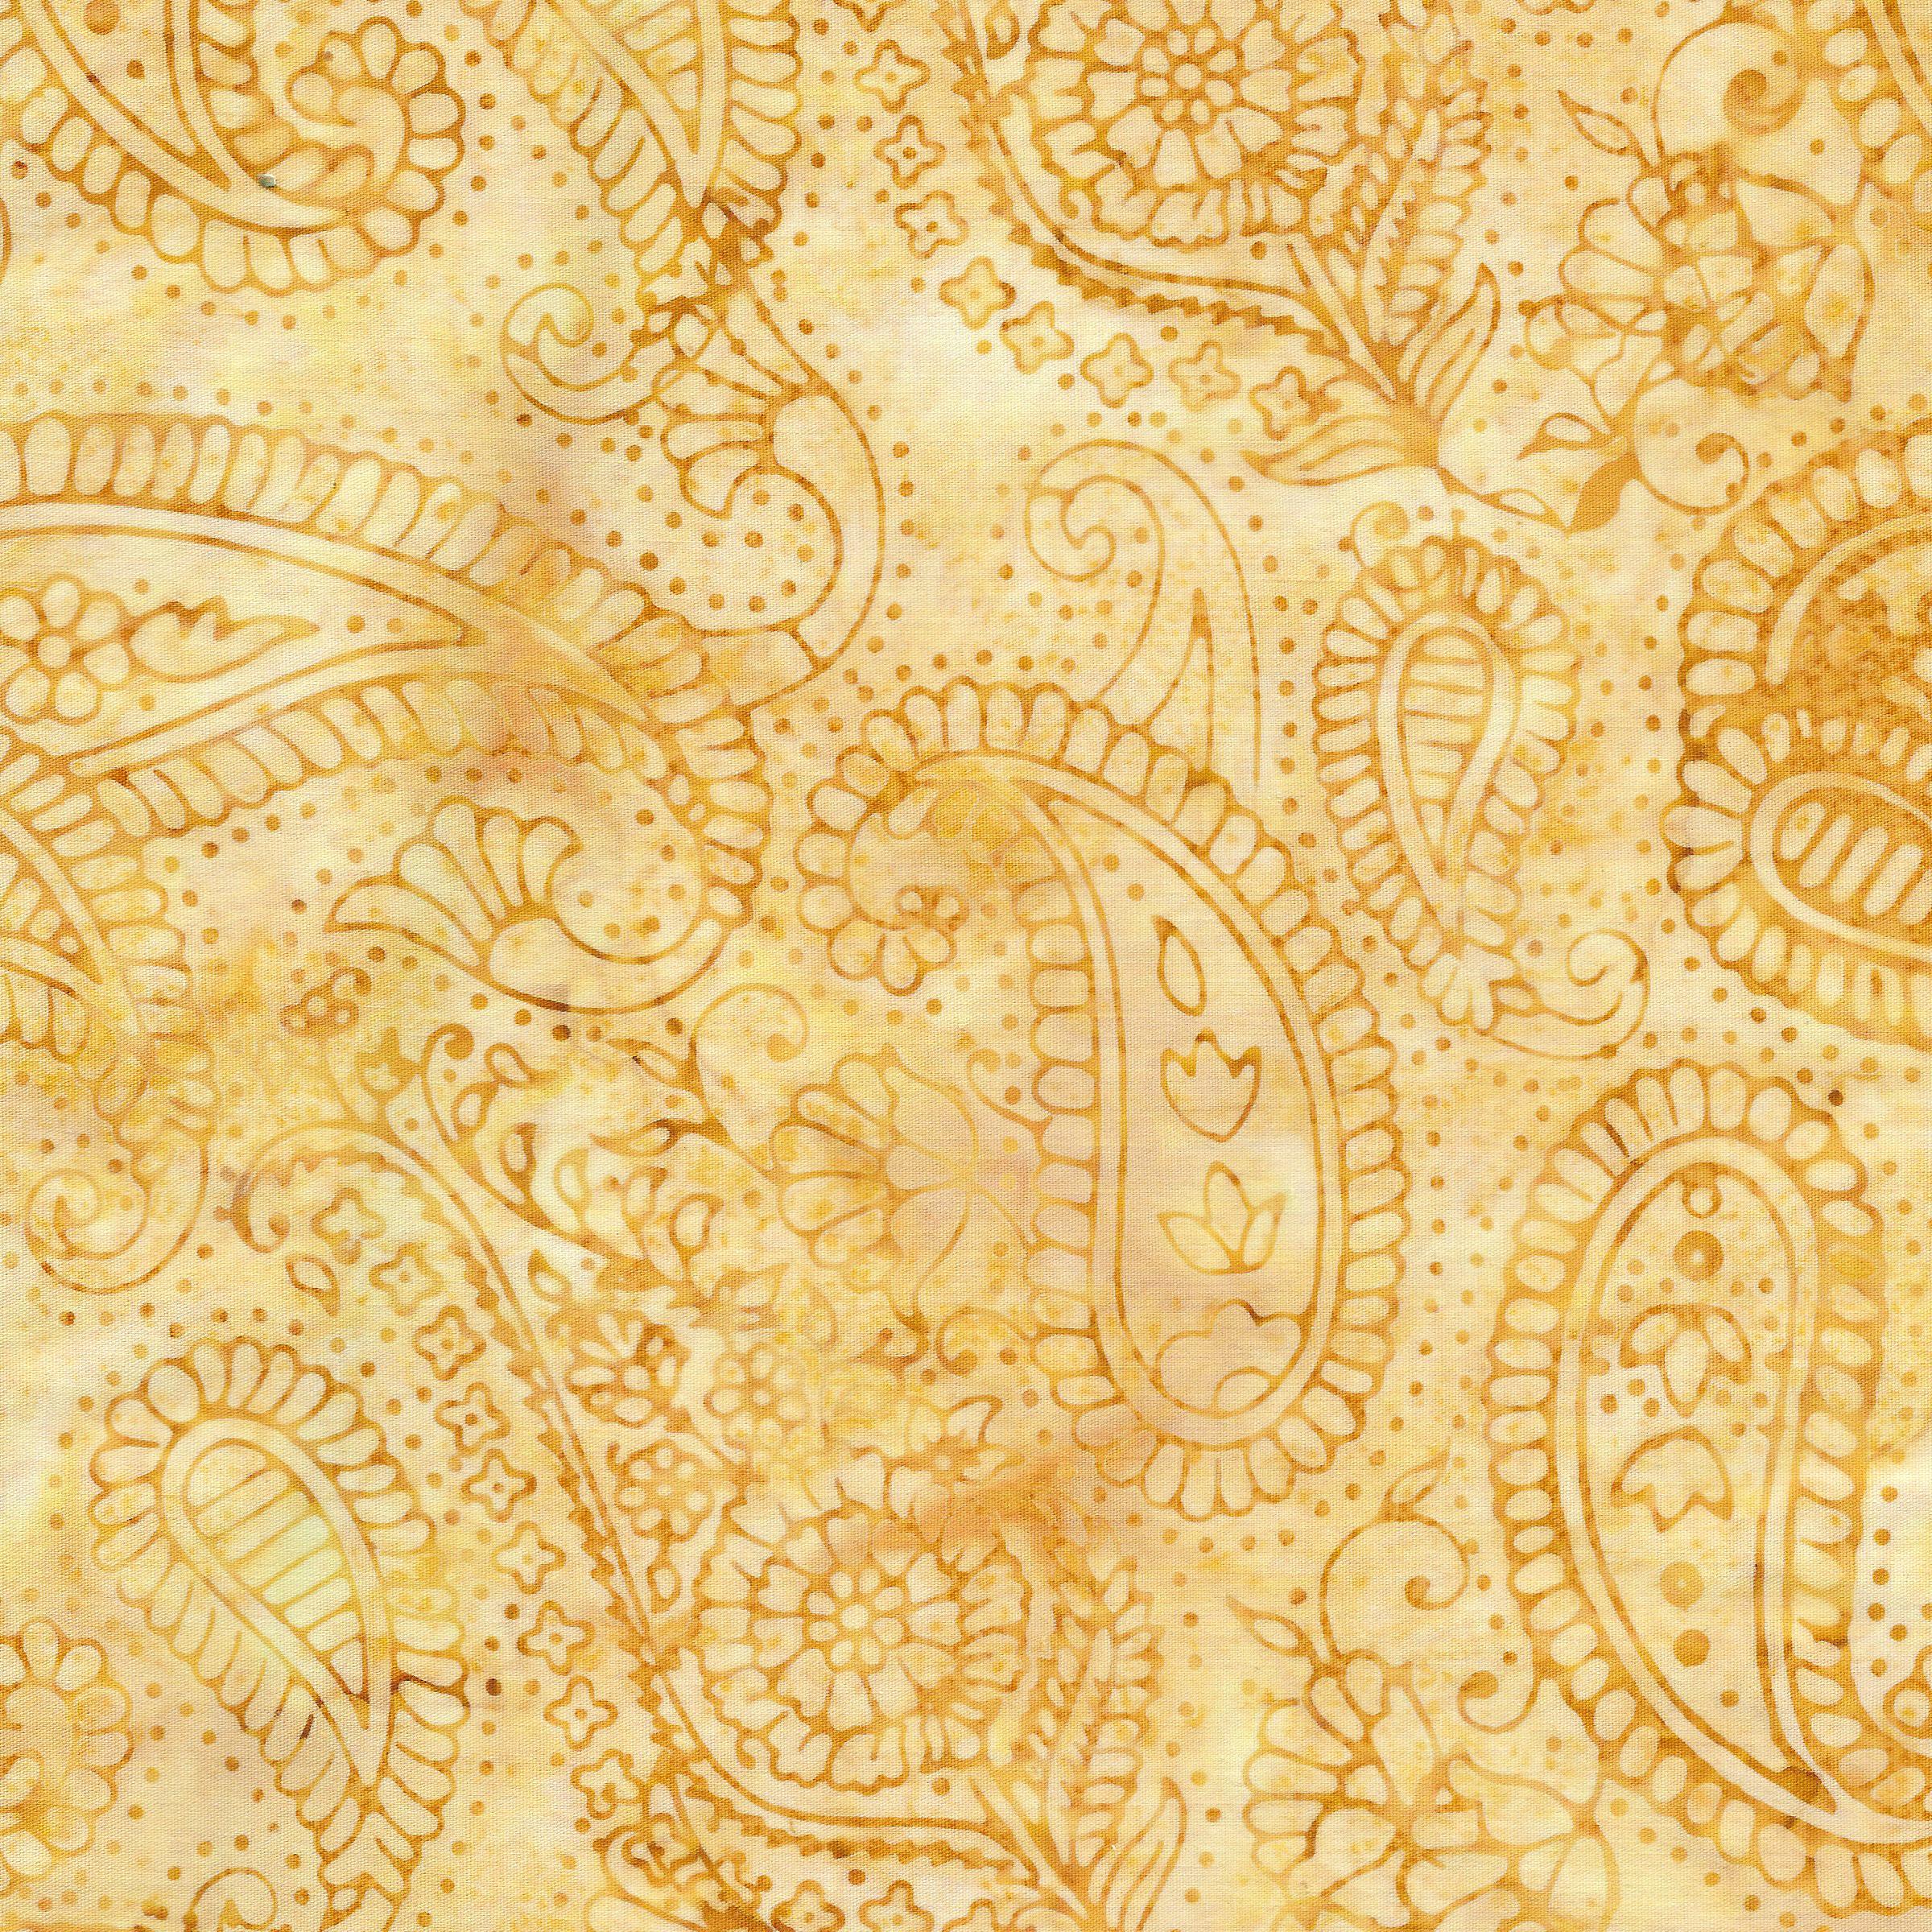 Paisley Outlining-Light Smore Island Batik